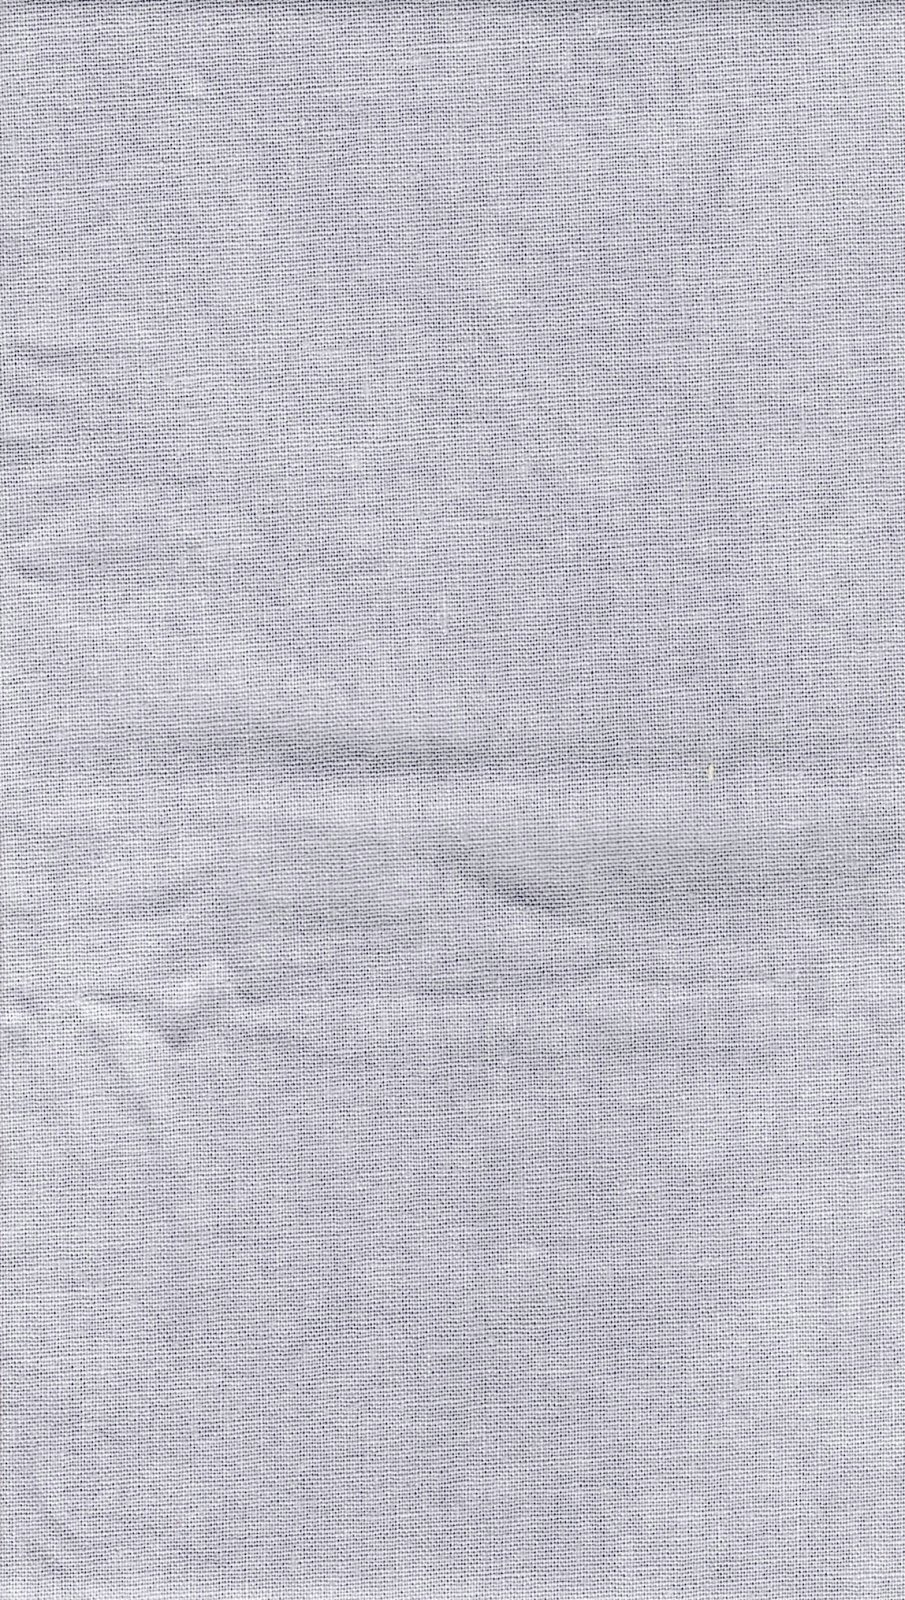 Stone Hand-Dyed Linen Fat Quarter